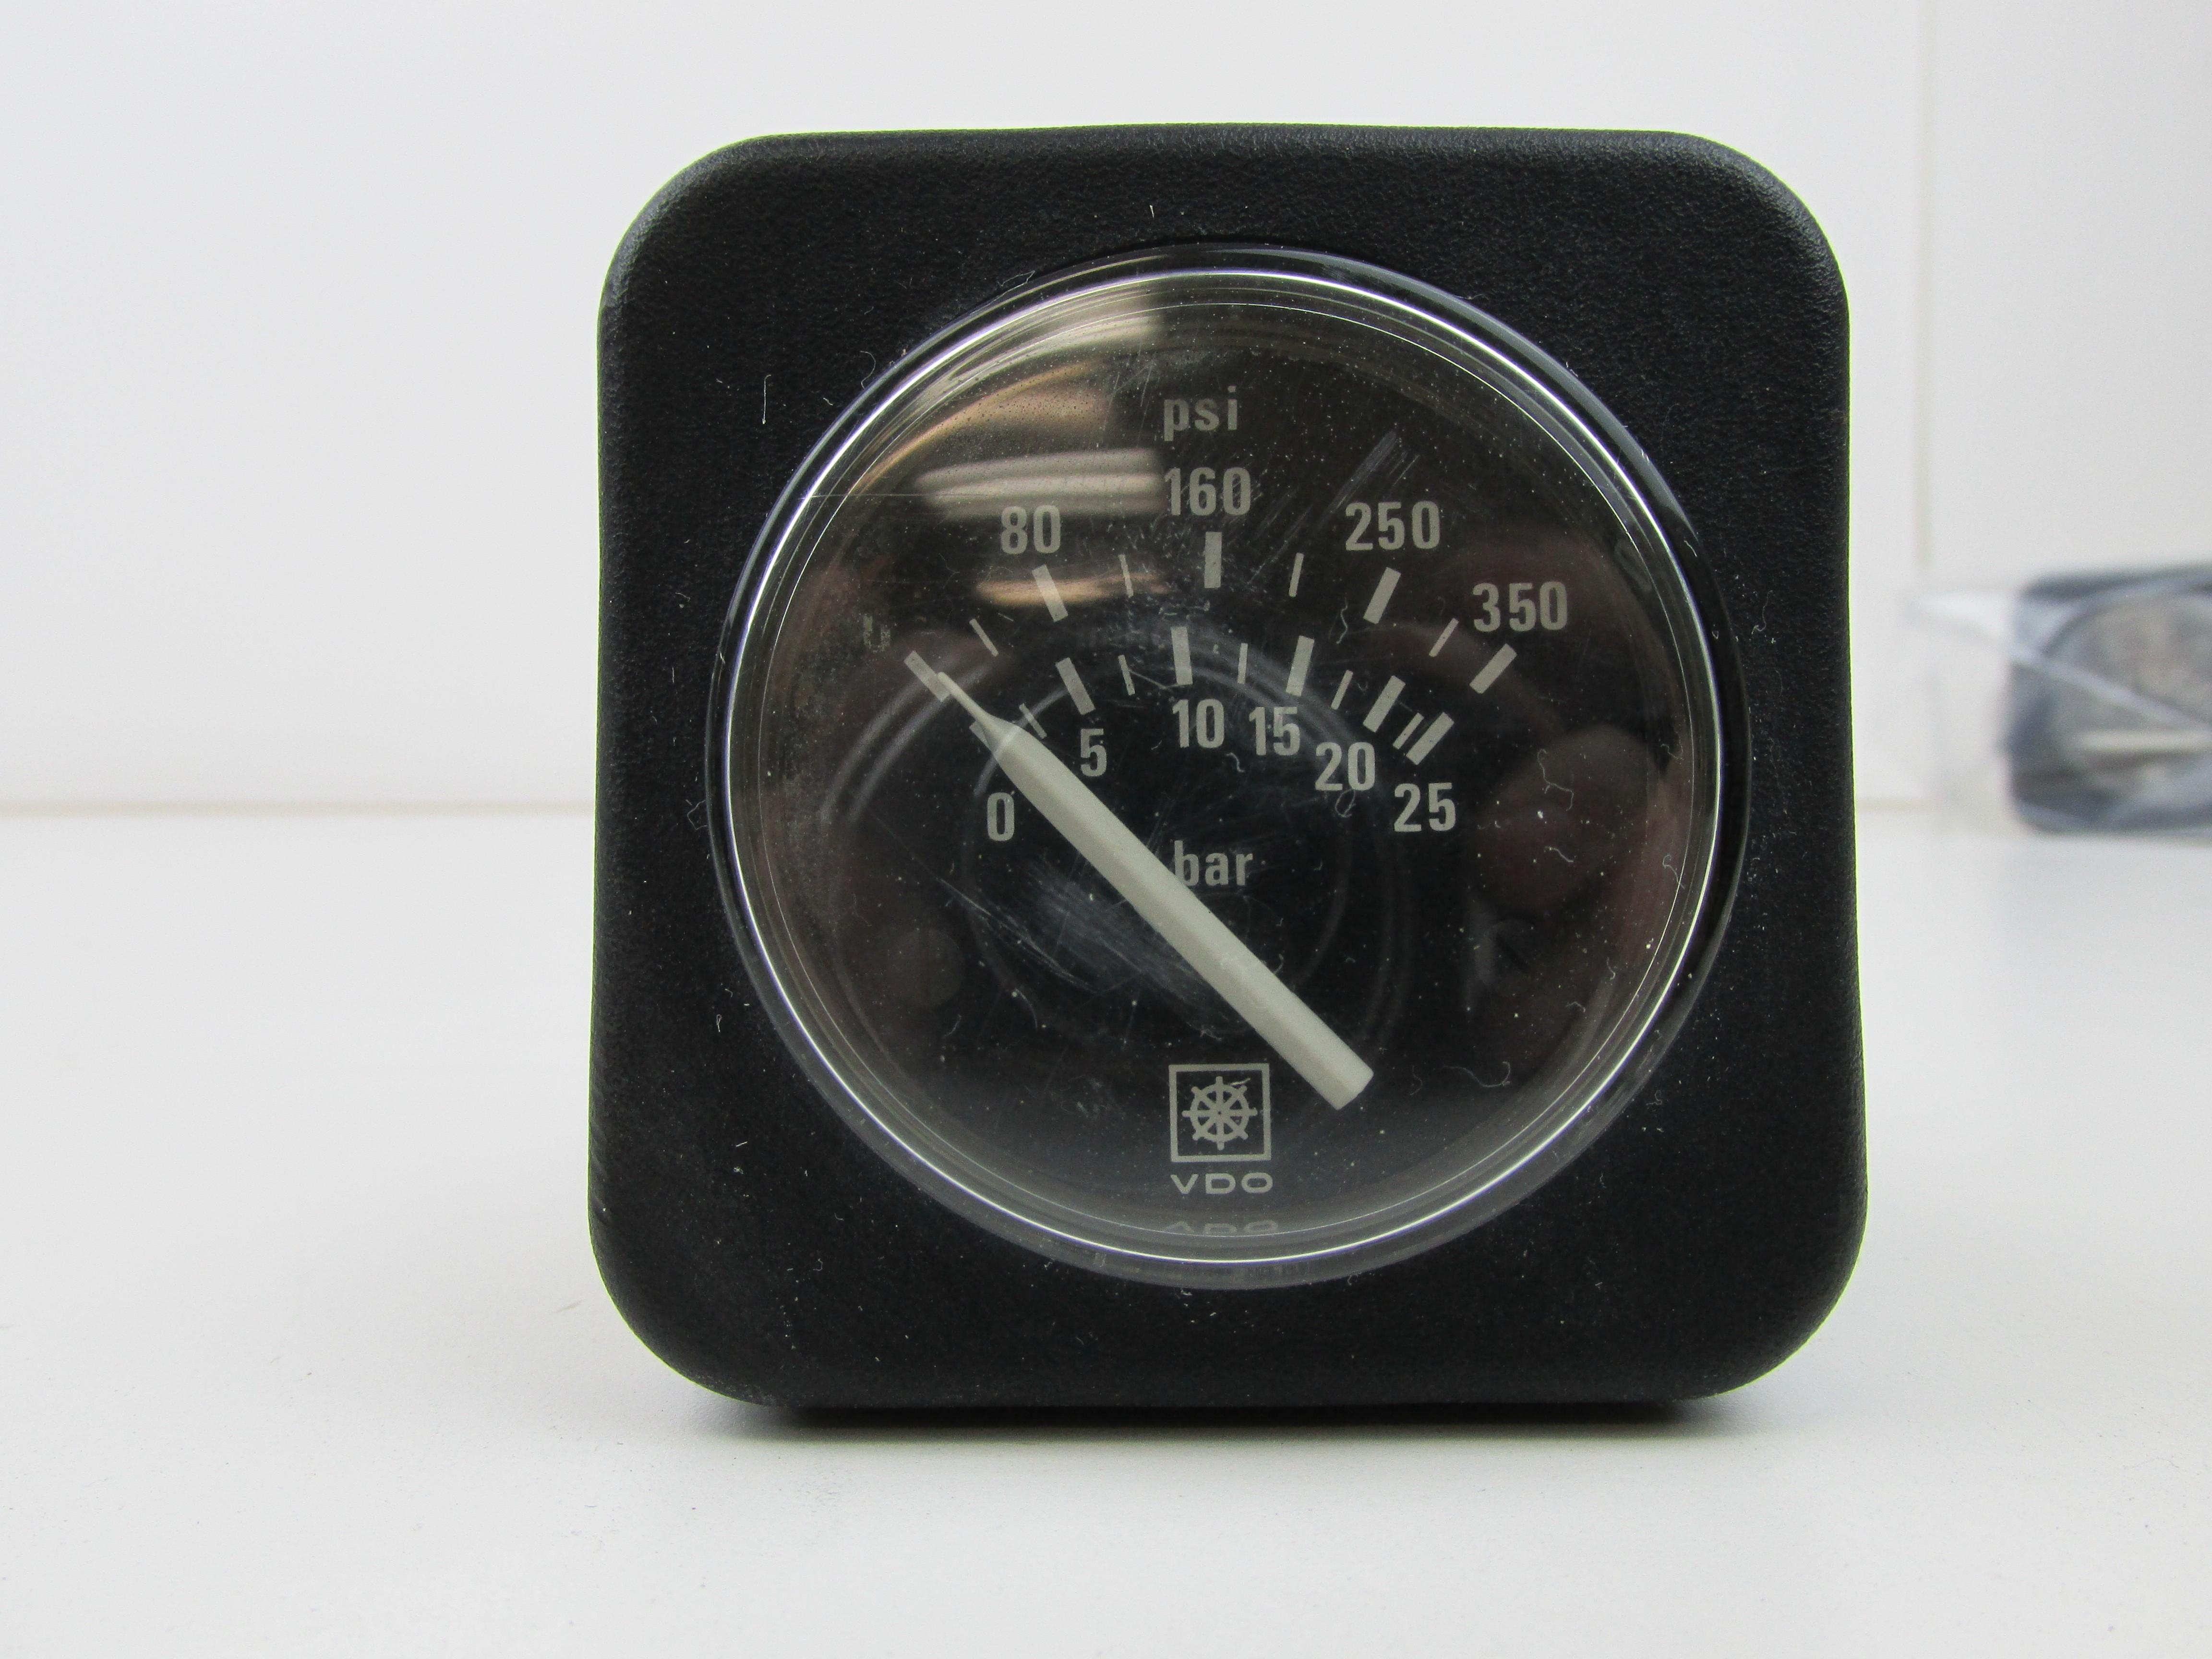 Vdo Oil Pressure Gauge Wiring Cummins Vdo 0 350 Psi Pressure Gauge Of Vdo Oil Pressure Gauge Wiring